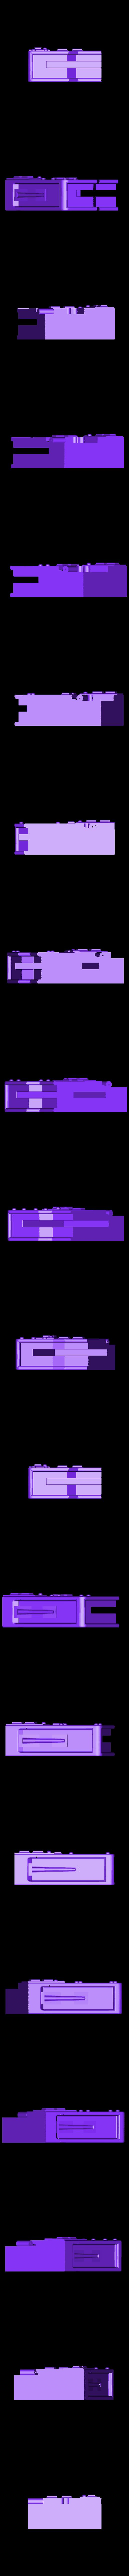 main_body_part_3.stl Download free STL file ORCA communicator (Godzilla) • 3D printing object, poblocki1982